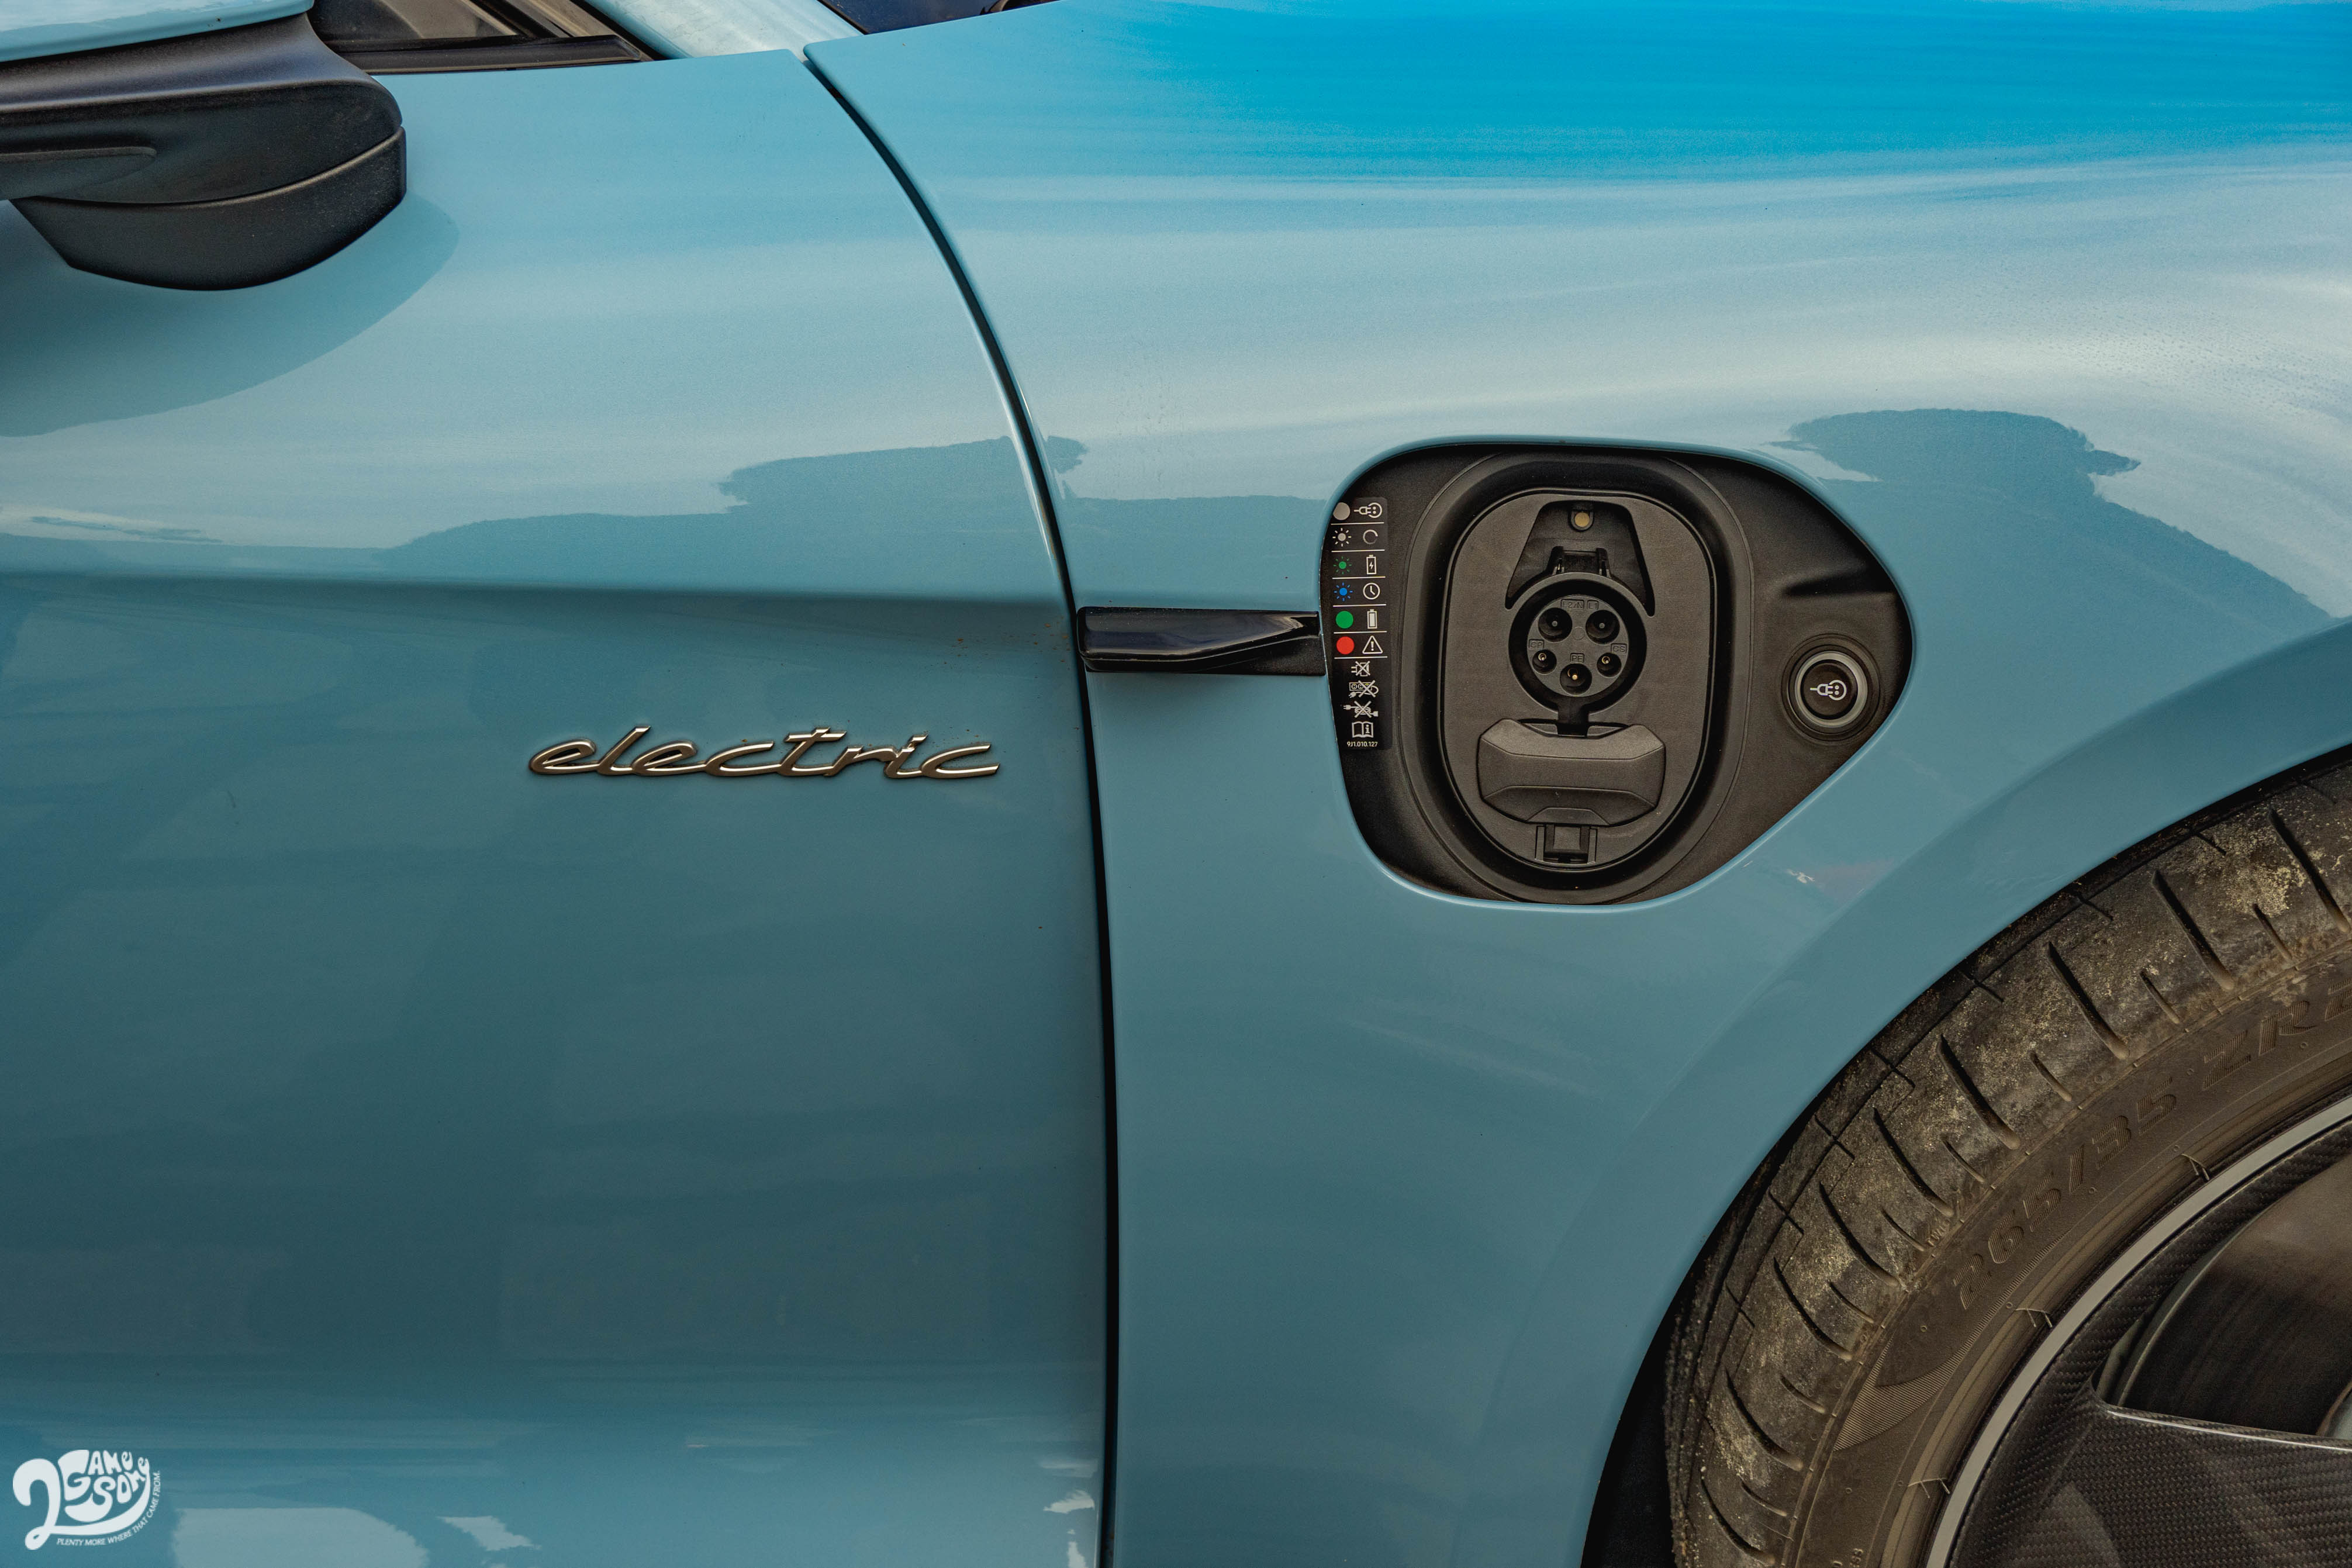 Porsche Taycan 台灣市場支援 Type 1(美規) 交流電充電,與 CCS1 直流電高速充電。